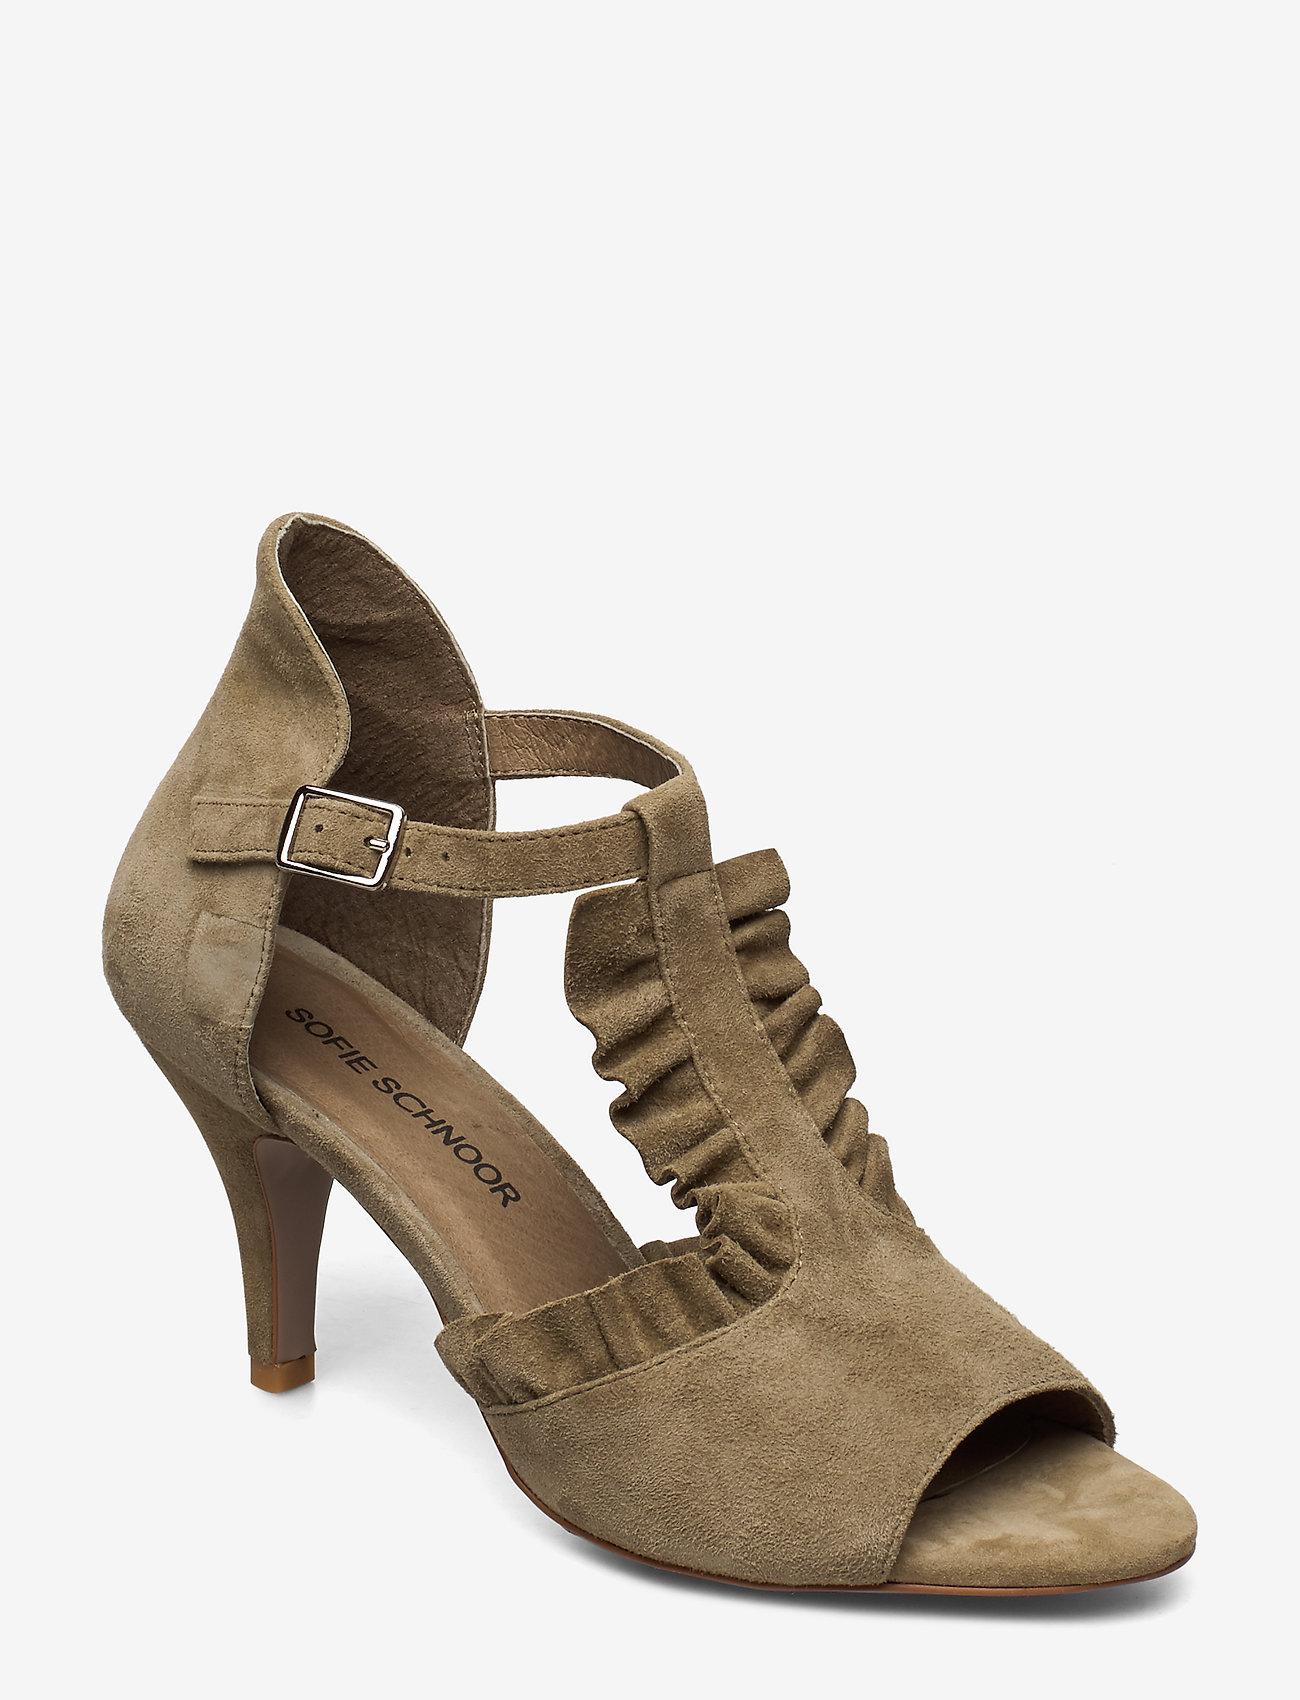 Sofie Schnoor - Shoe - sandales à talons - green - 0